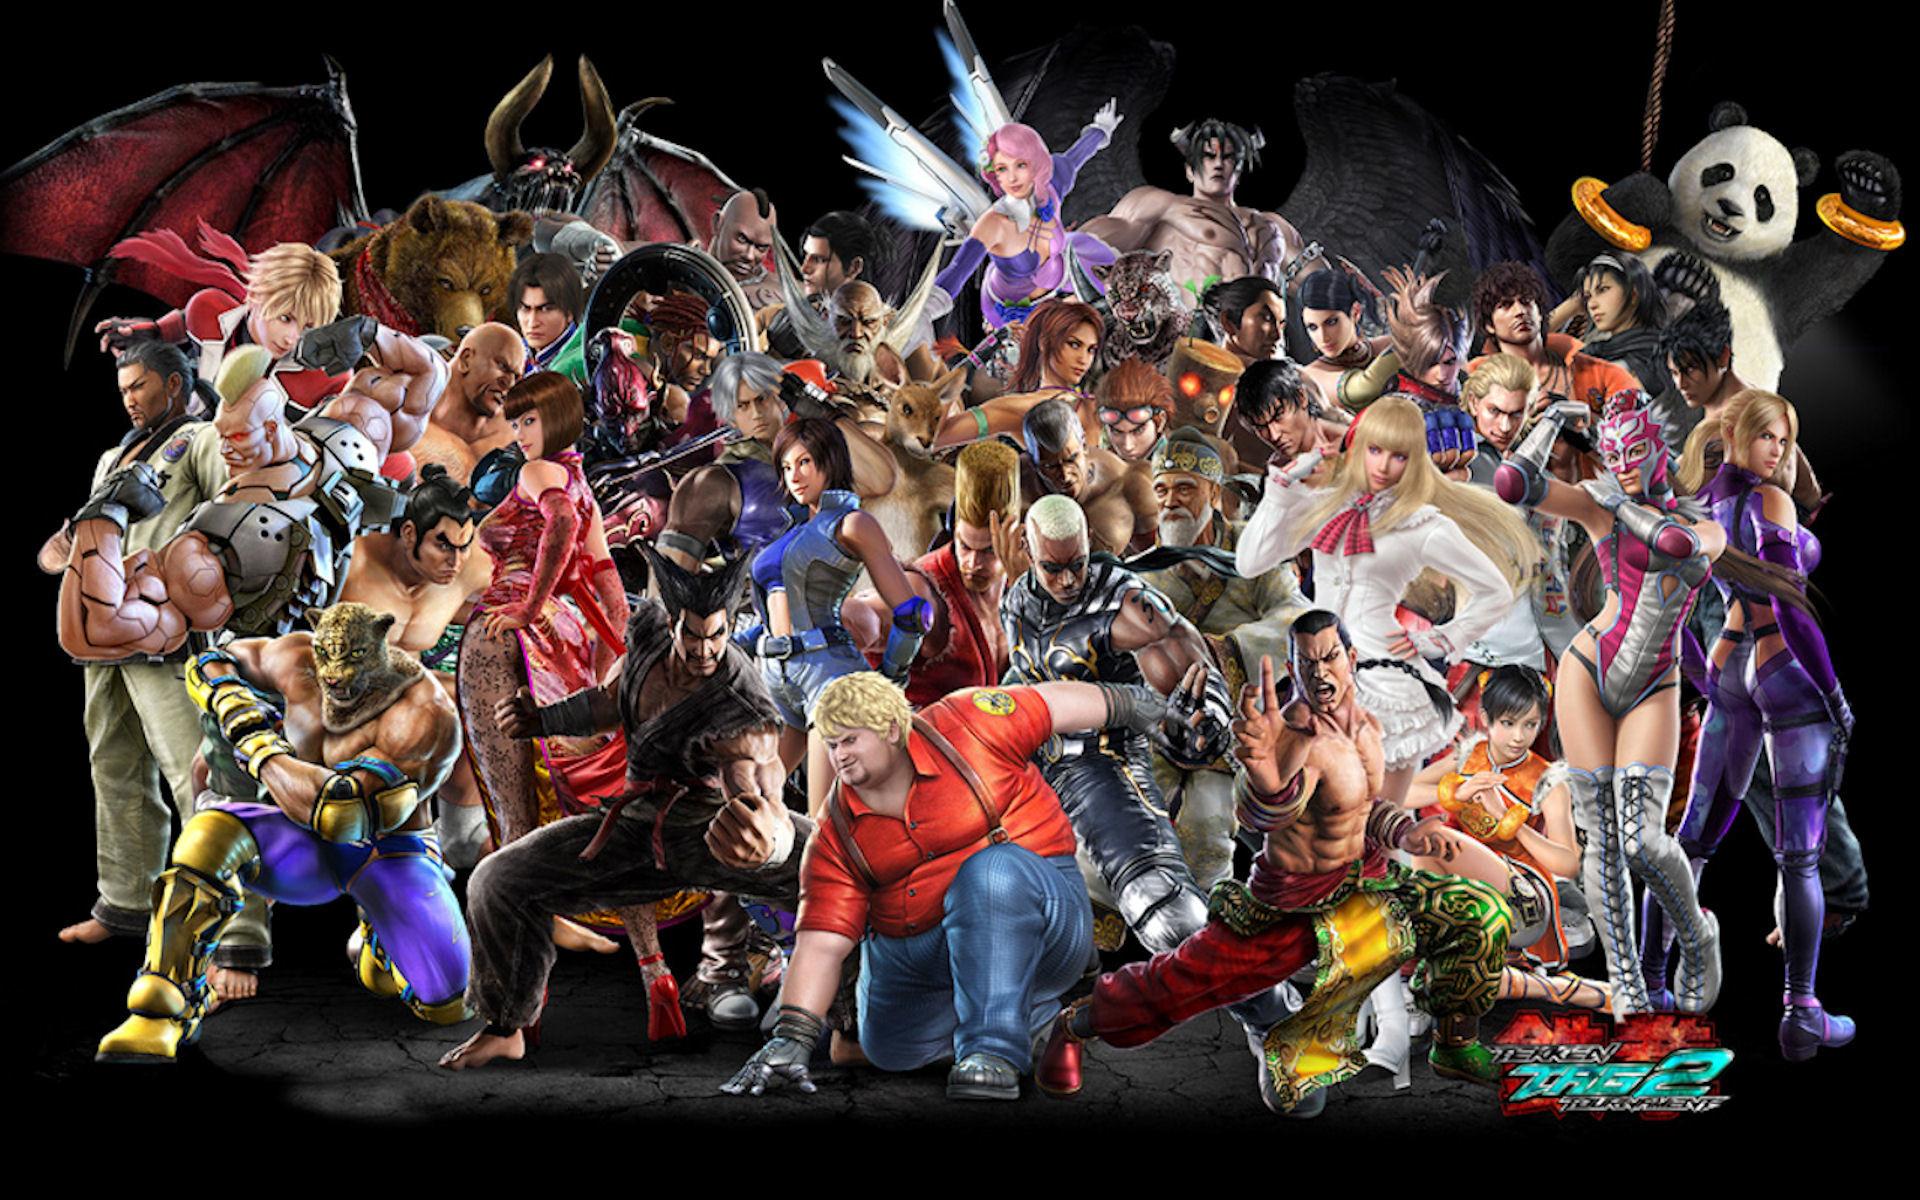 Tekken Tag Tournament 3 HD Wide Wallpaper for Widescreen (65 Wallpapers) –  HD Wallpapers